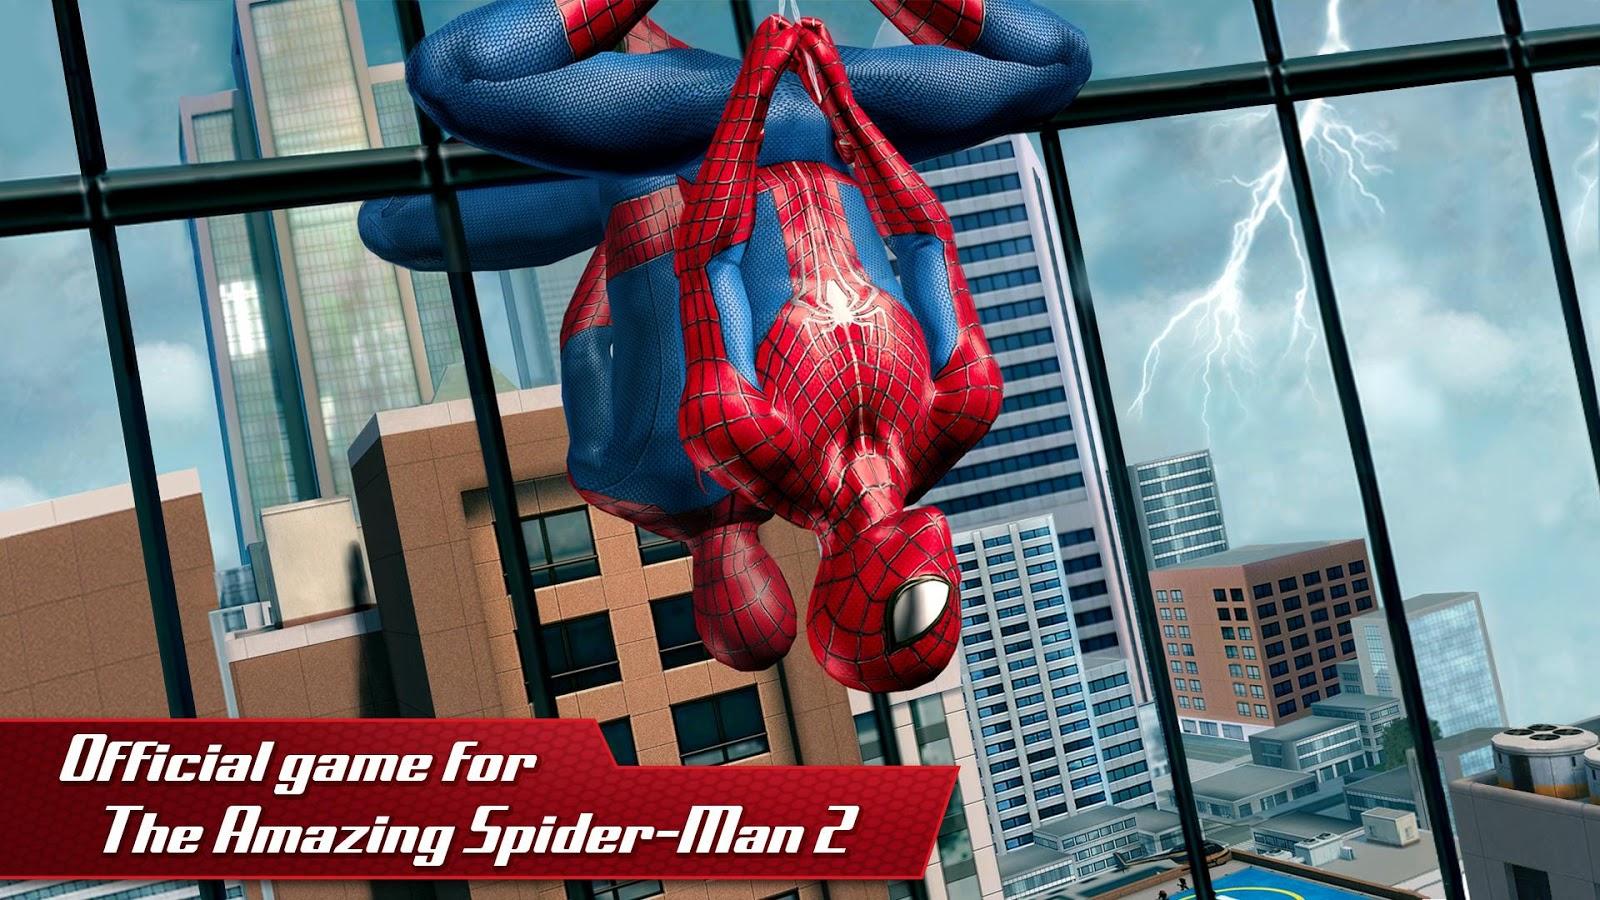 art - Amazing Spider-Man 2, the